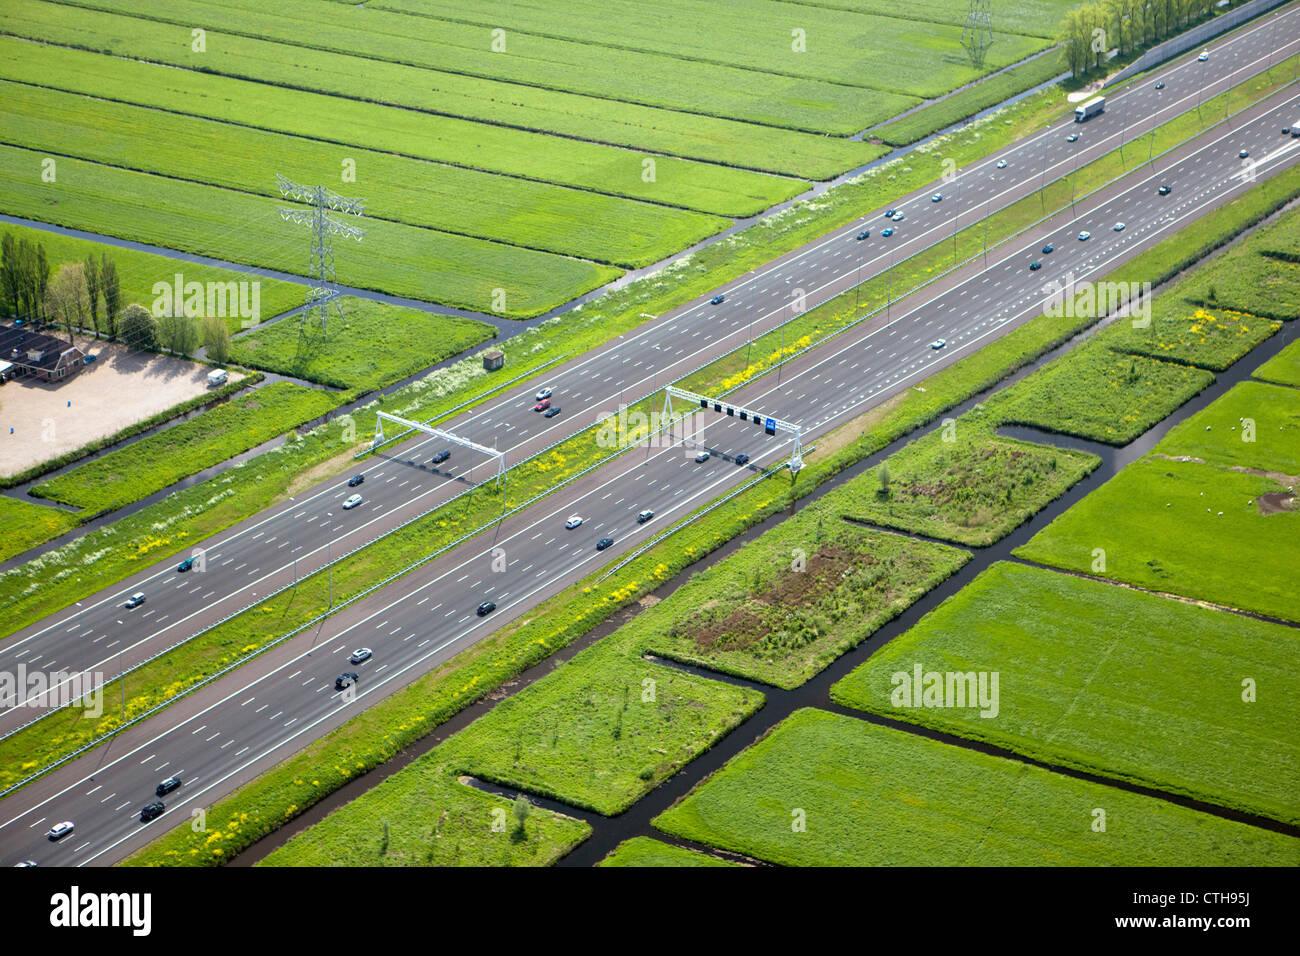 Netherlands, Breukelen, A2 highway. Aerial. - Stock Image